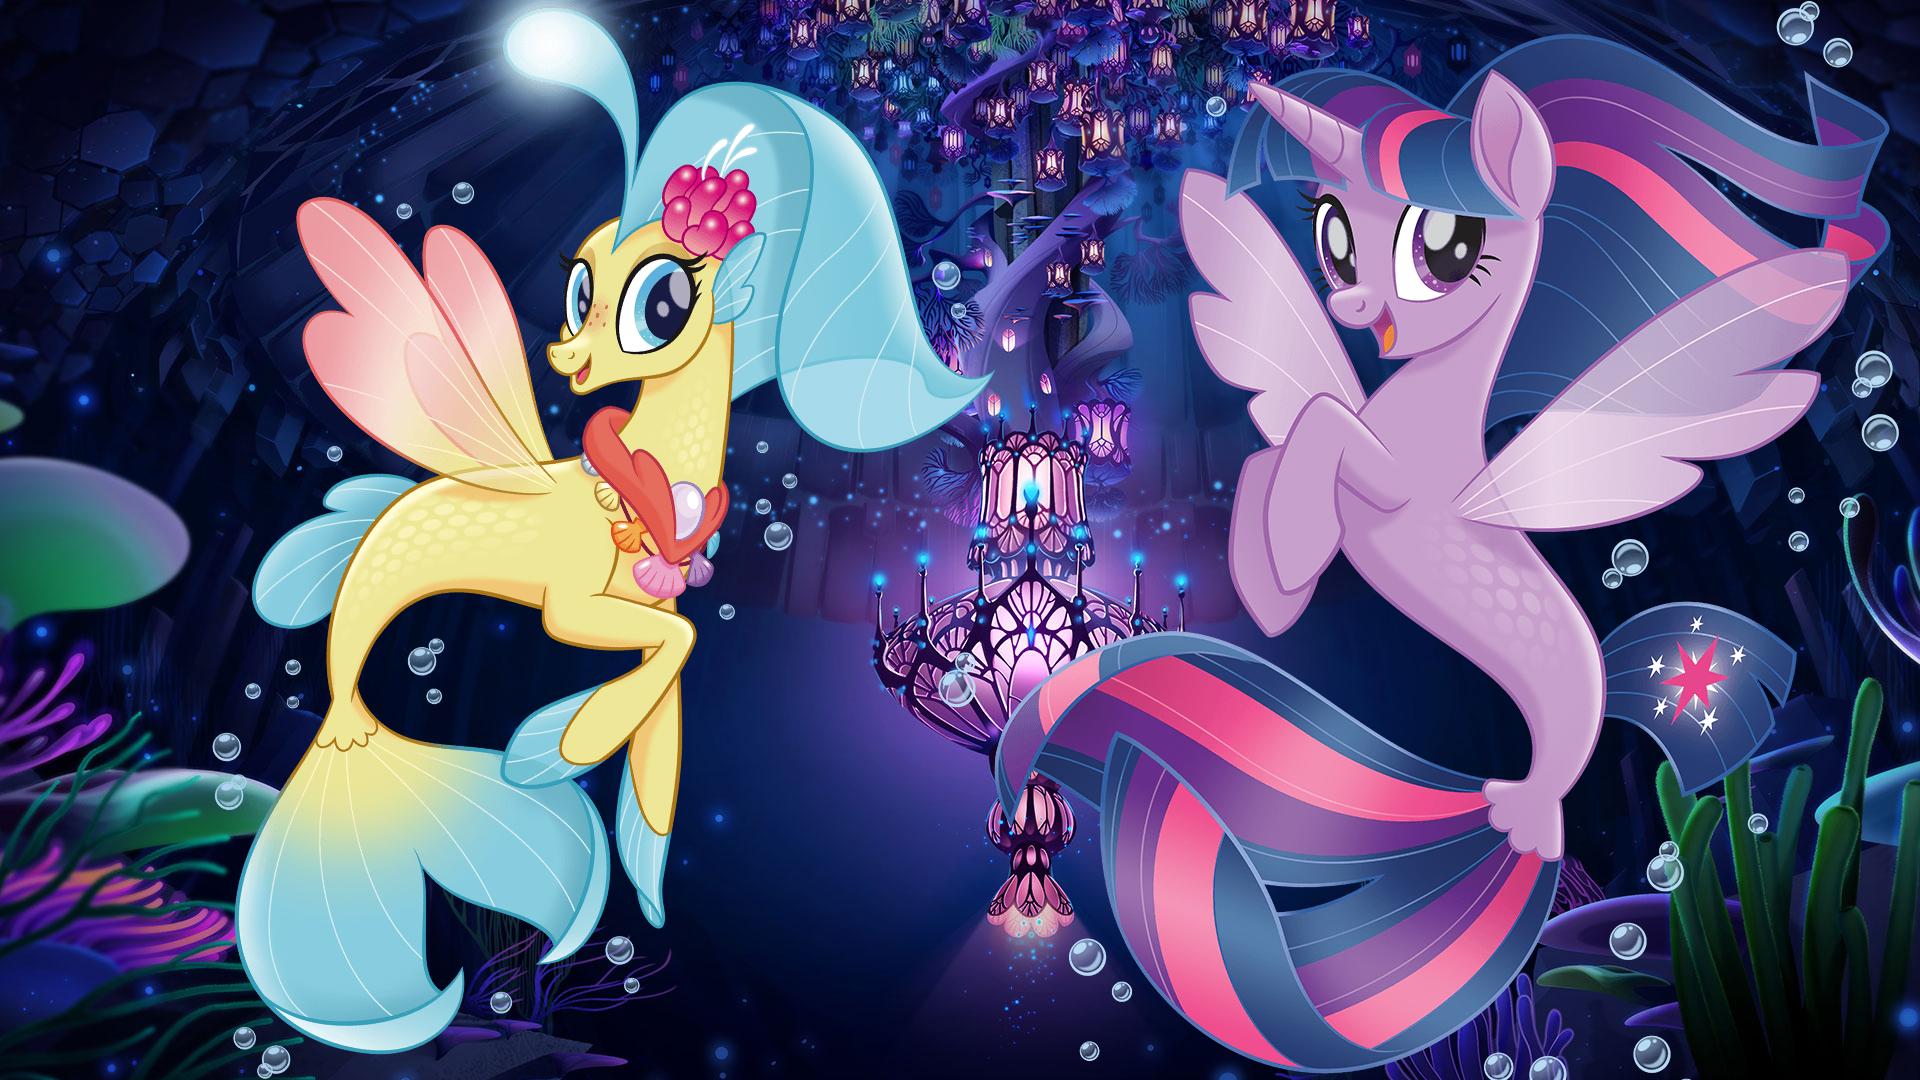 My Little Pony The Movie Wallpaper Mermaid Princess Sky Star And Twilight Sparkle